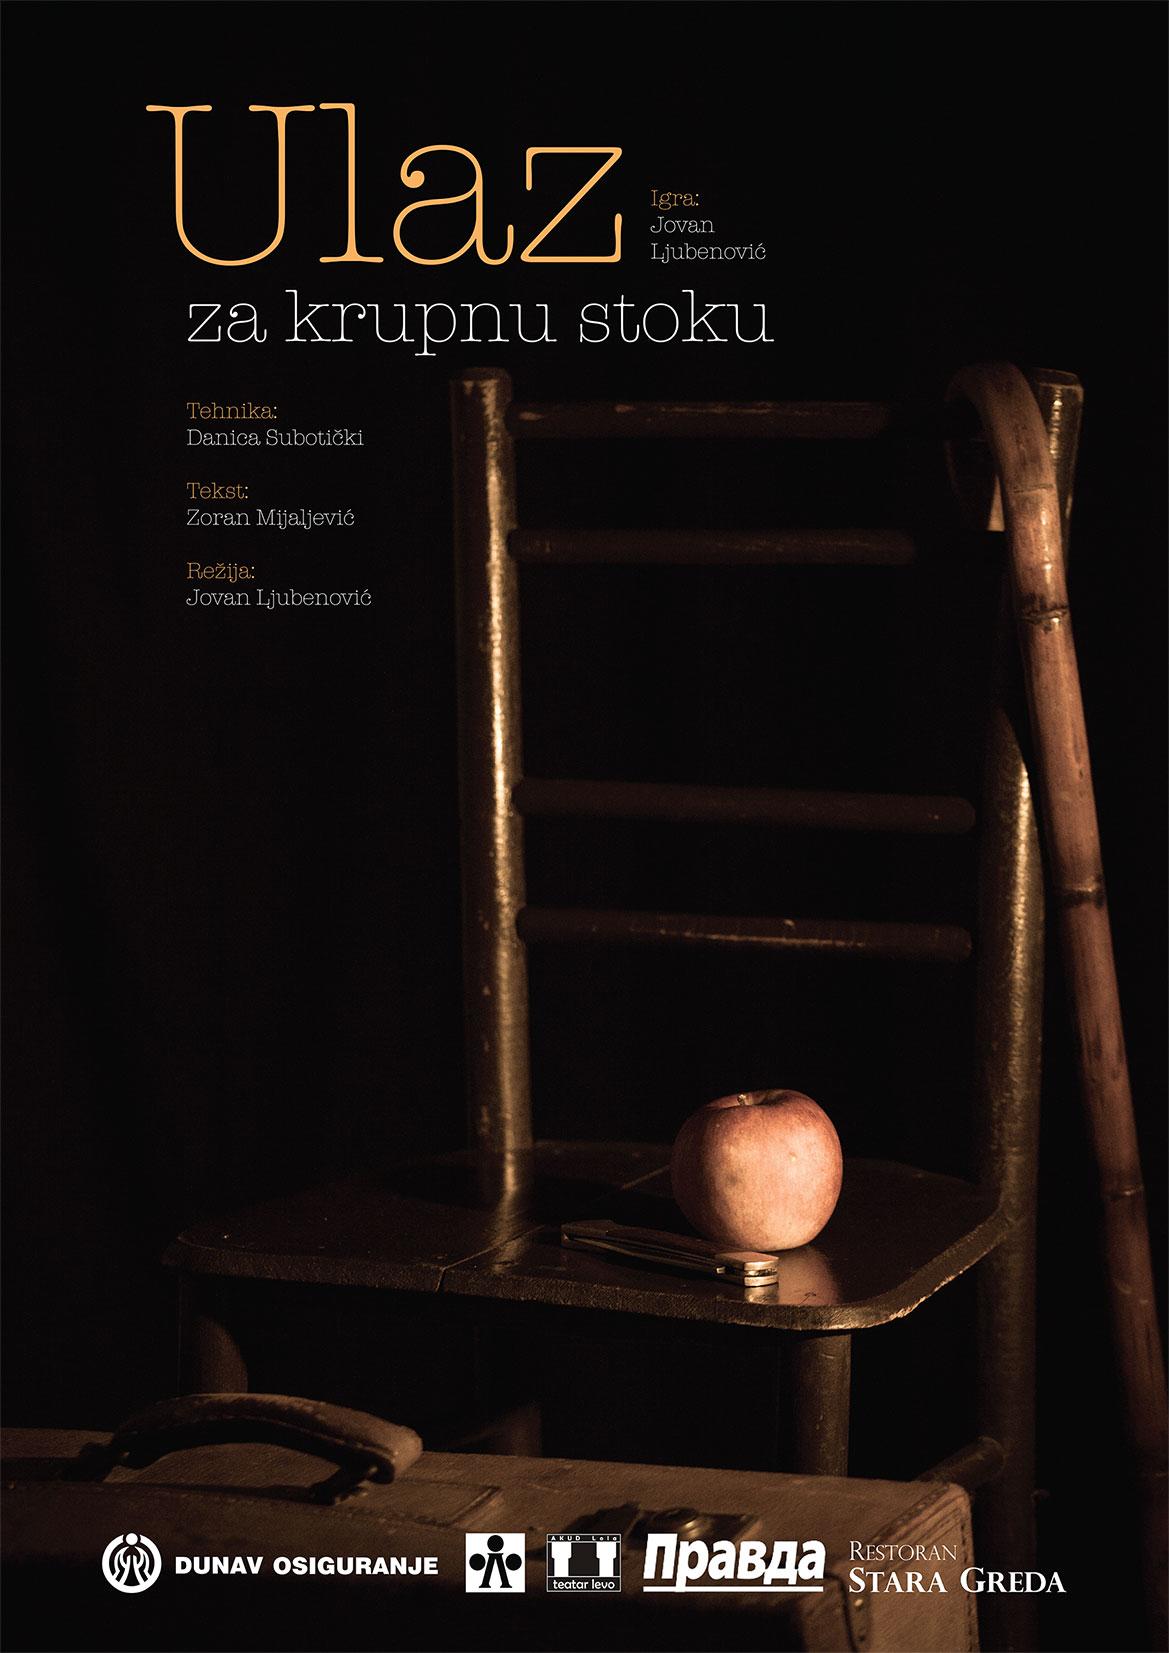 UlazZaKrupnuStoku-Plakat